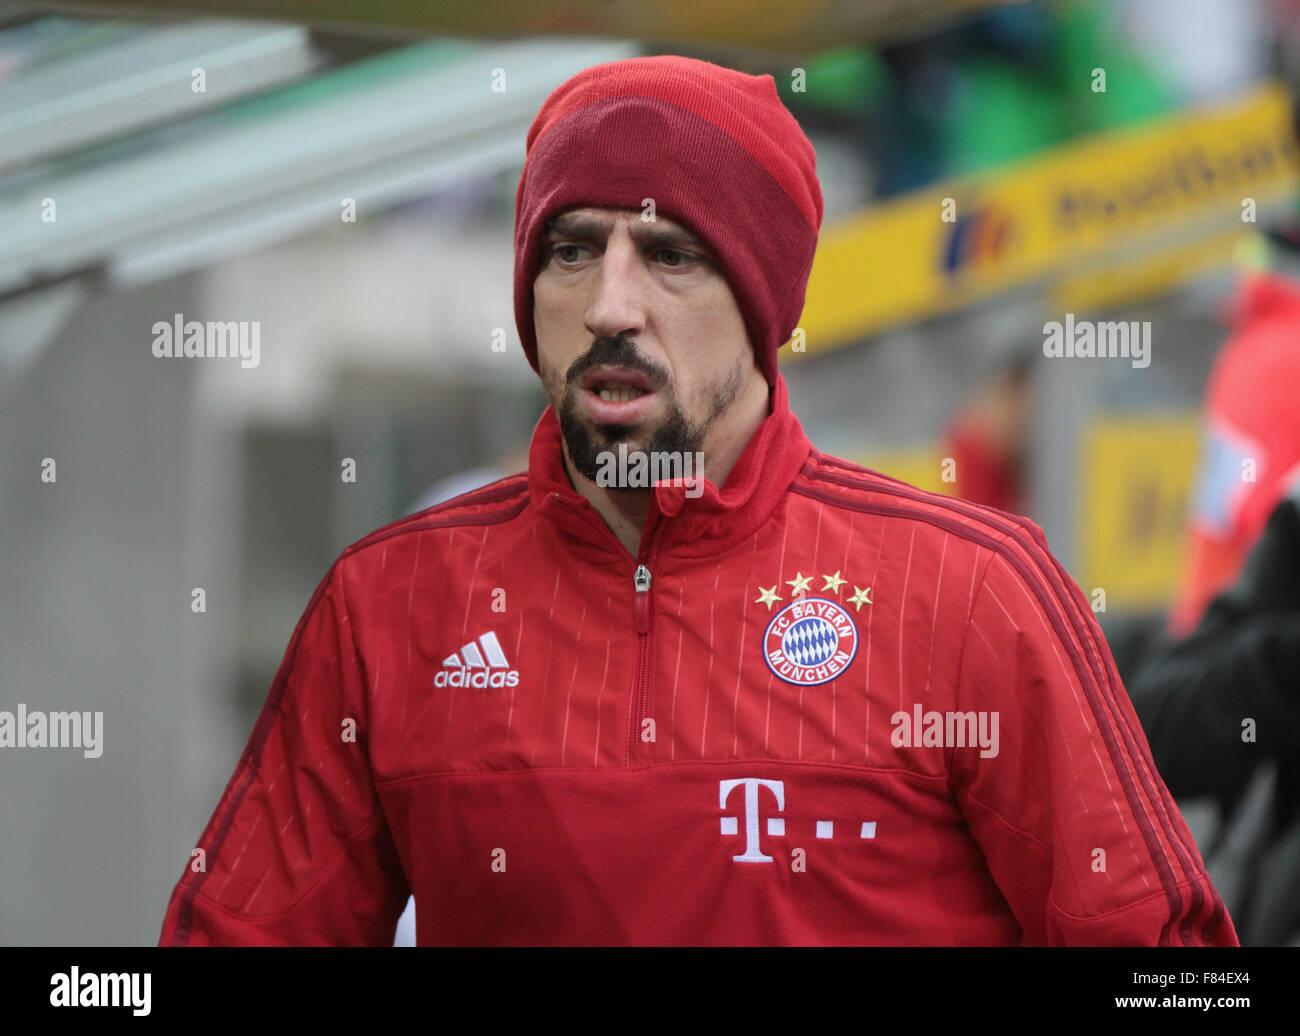 Germany, Bandesliga, Borussia Moenchengladbach vs Bayern Muenchen, Moenchengladbach, 05.12.2015: Franck Ribery (Bayern - Stock Image